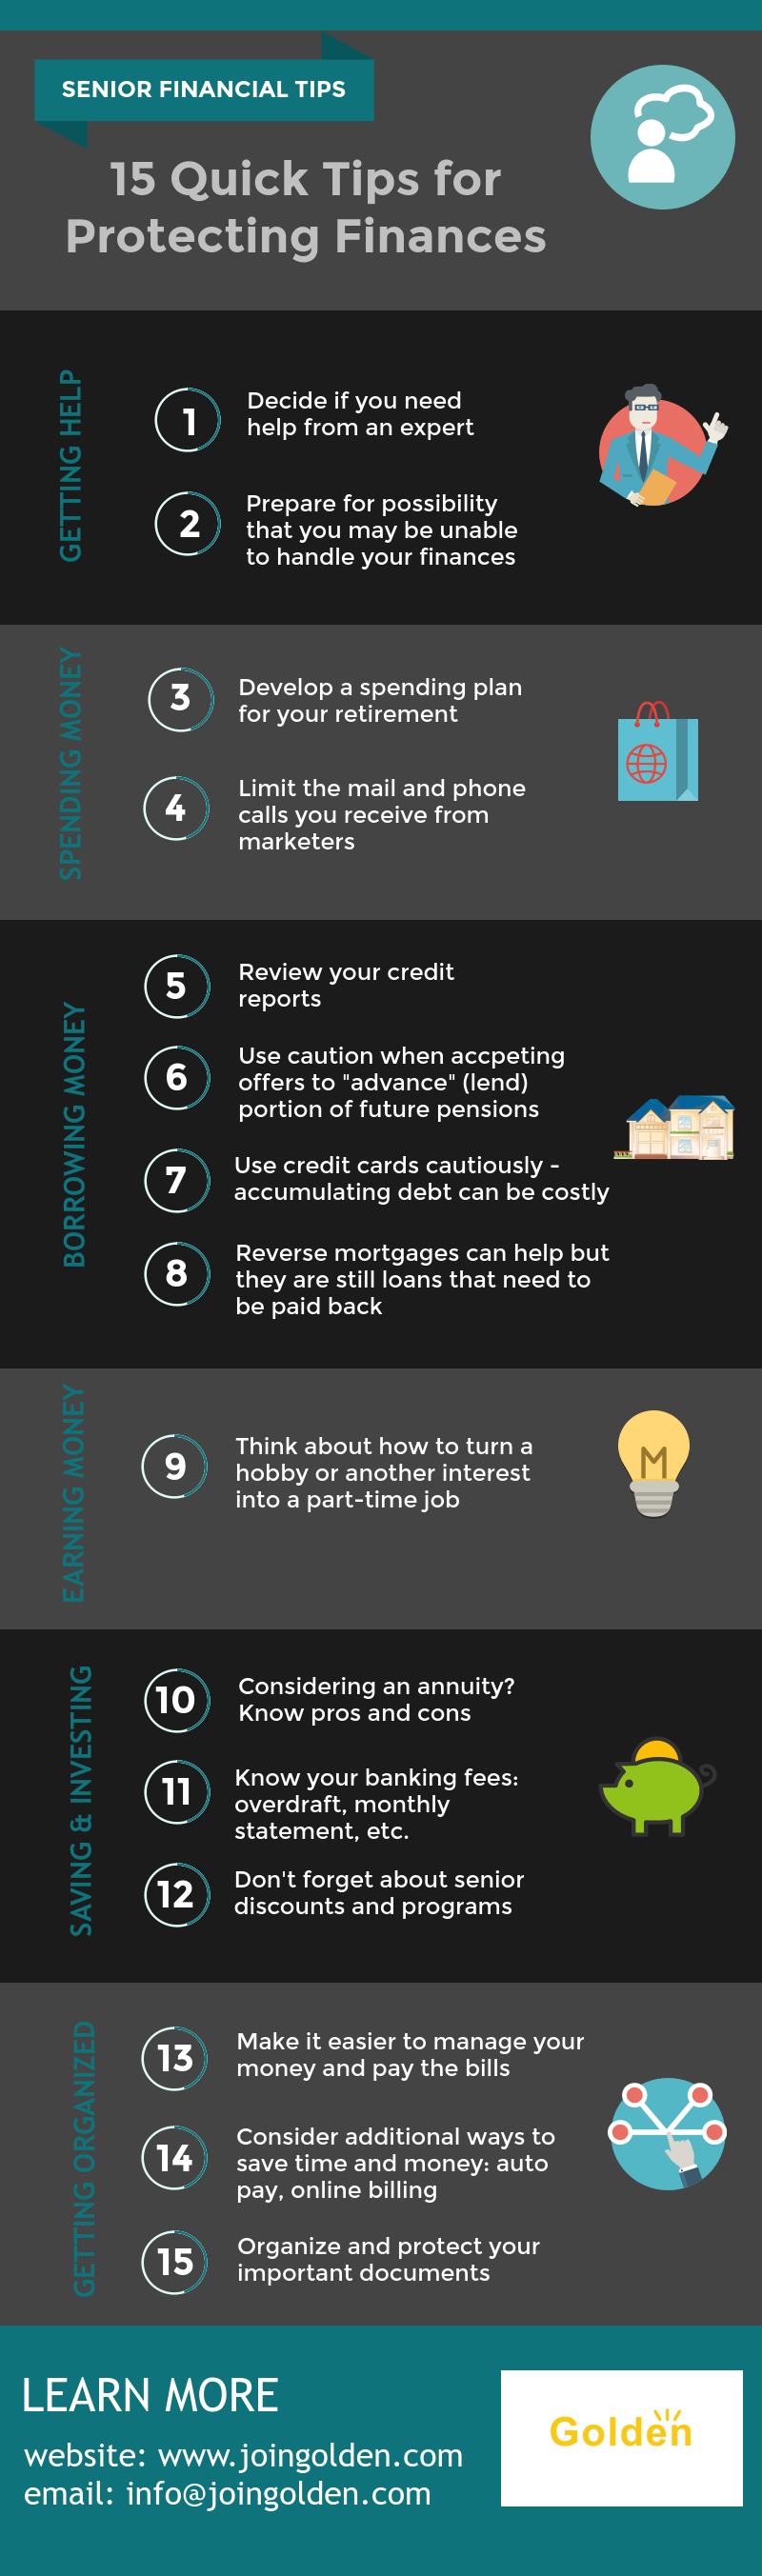 Senior Financial Tips